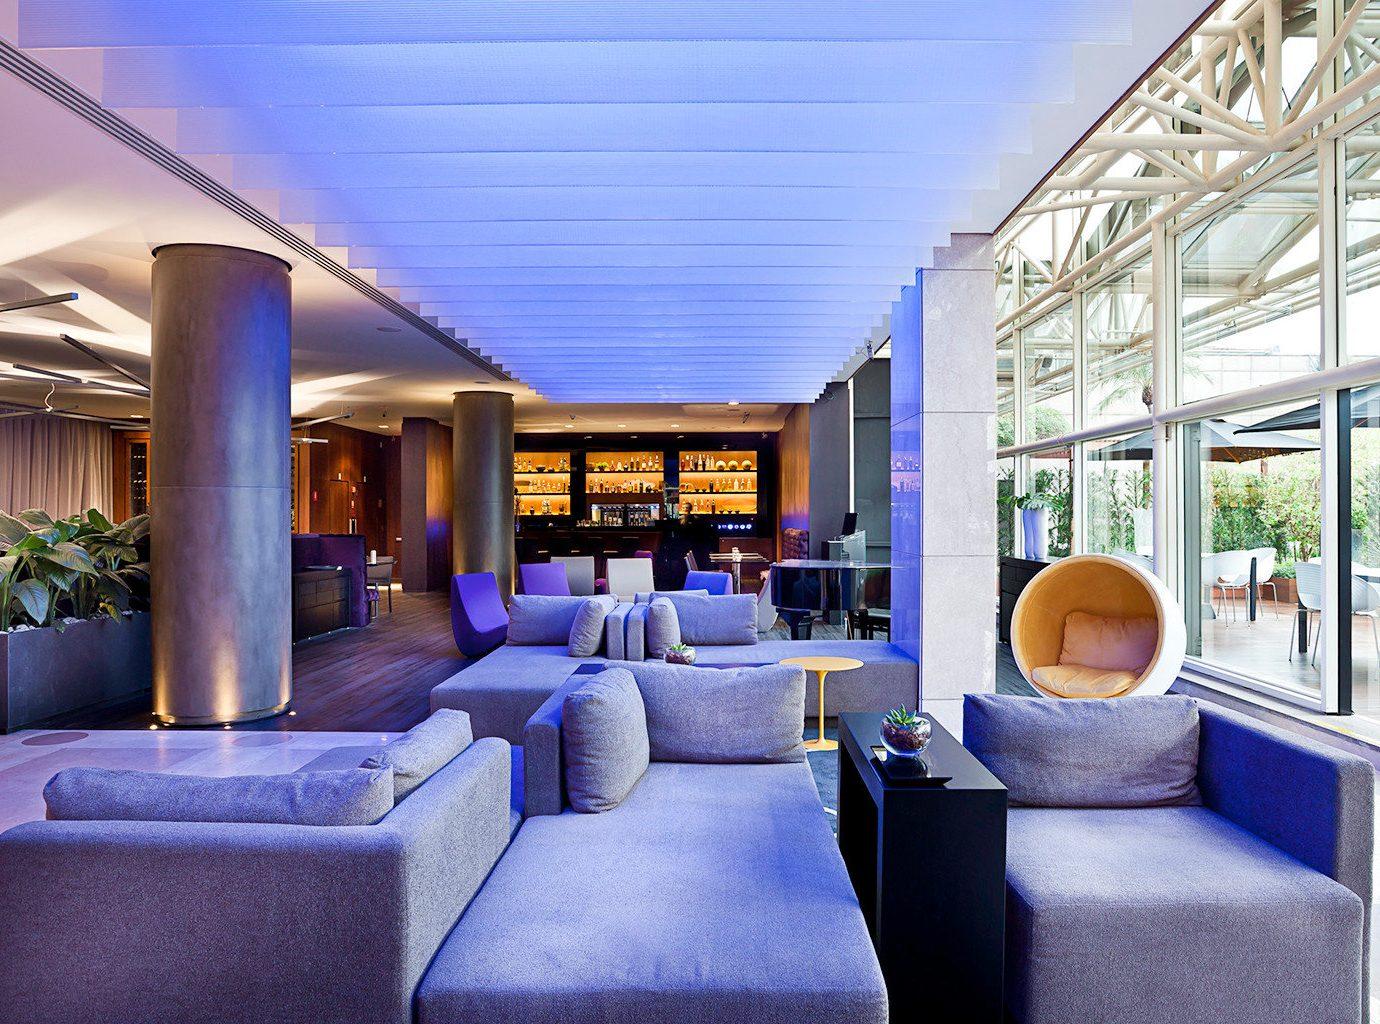 Bar Drink Lounge Modern Nightlife Resort property condominium living room home Lobby mansion convention center